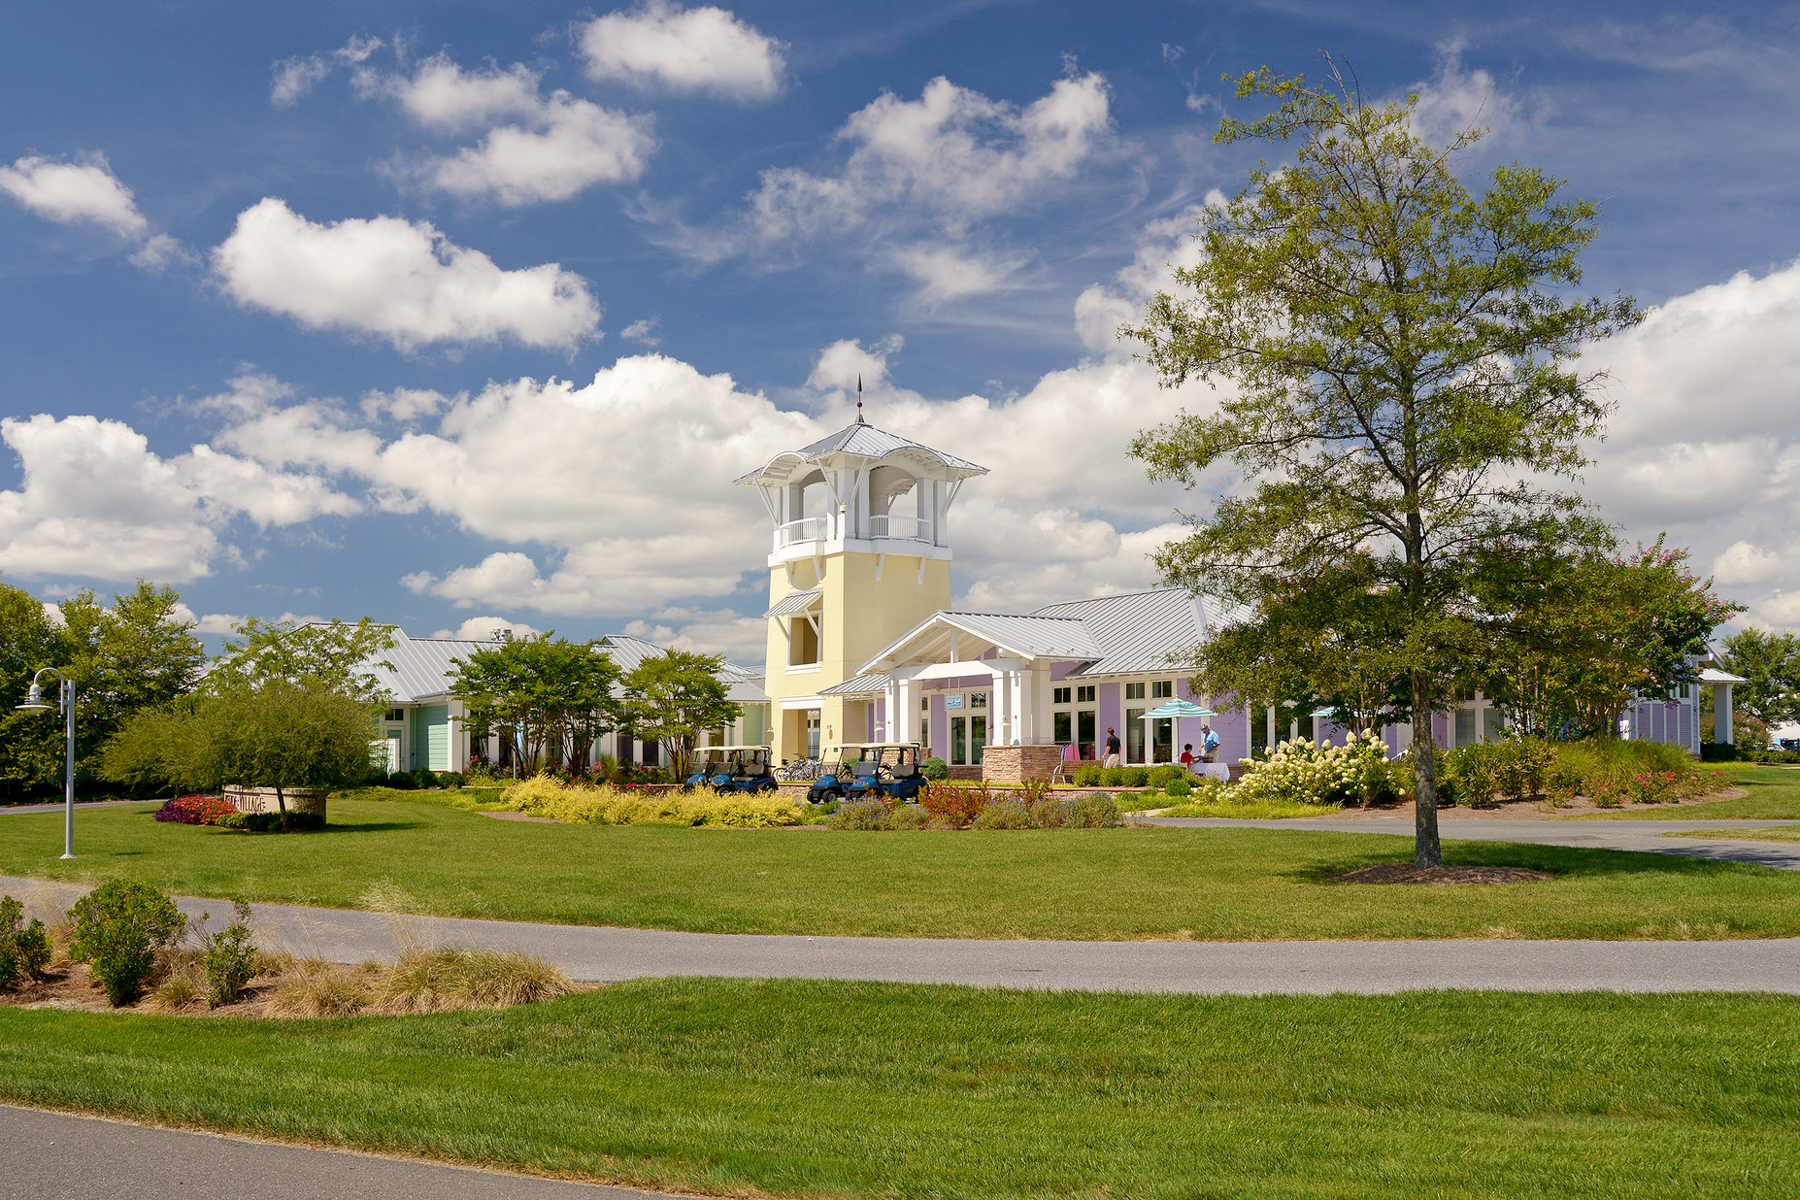 Additional photo for property listing at 33196 Mariners Ave, Millsboro, DE 19966 33196  Mariners Ave, Millsboro, Delaware 19966 Estados Unidos